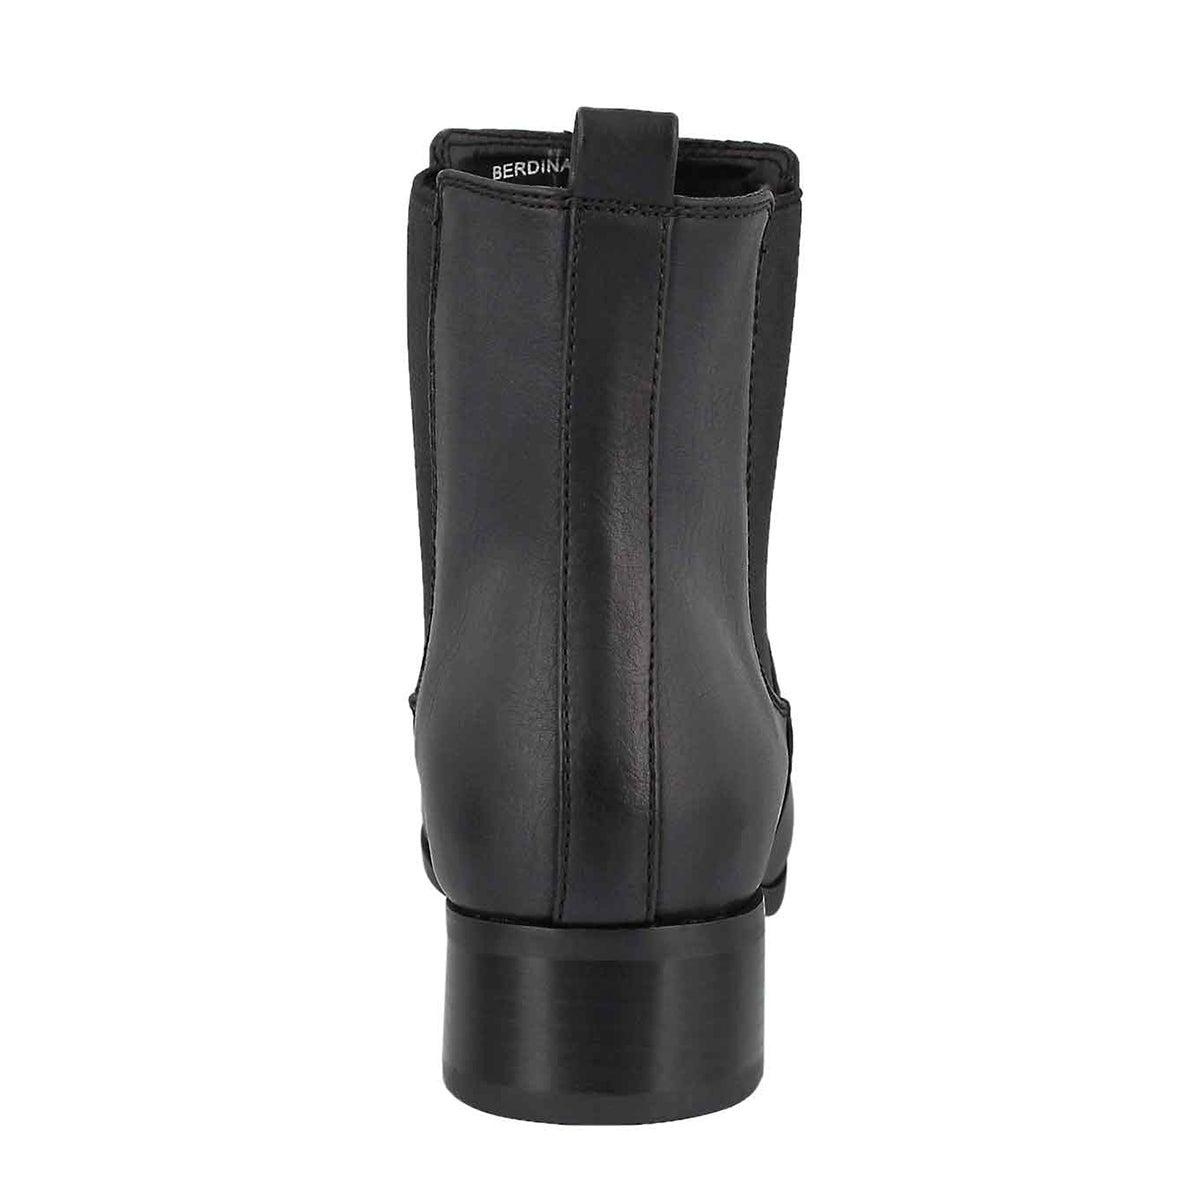 Lds Berdina black chelsea boot